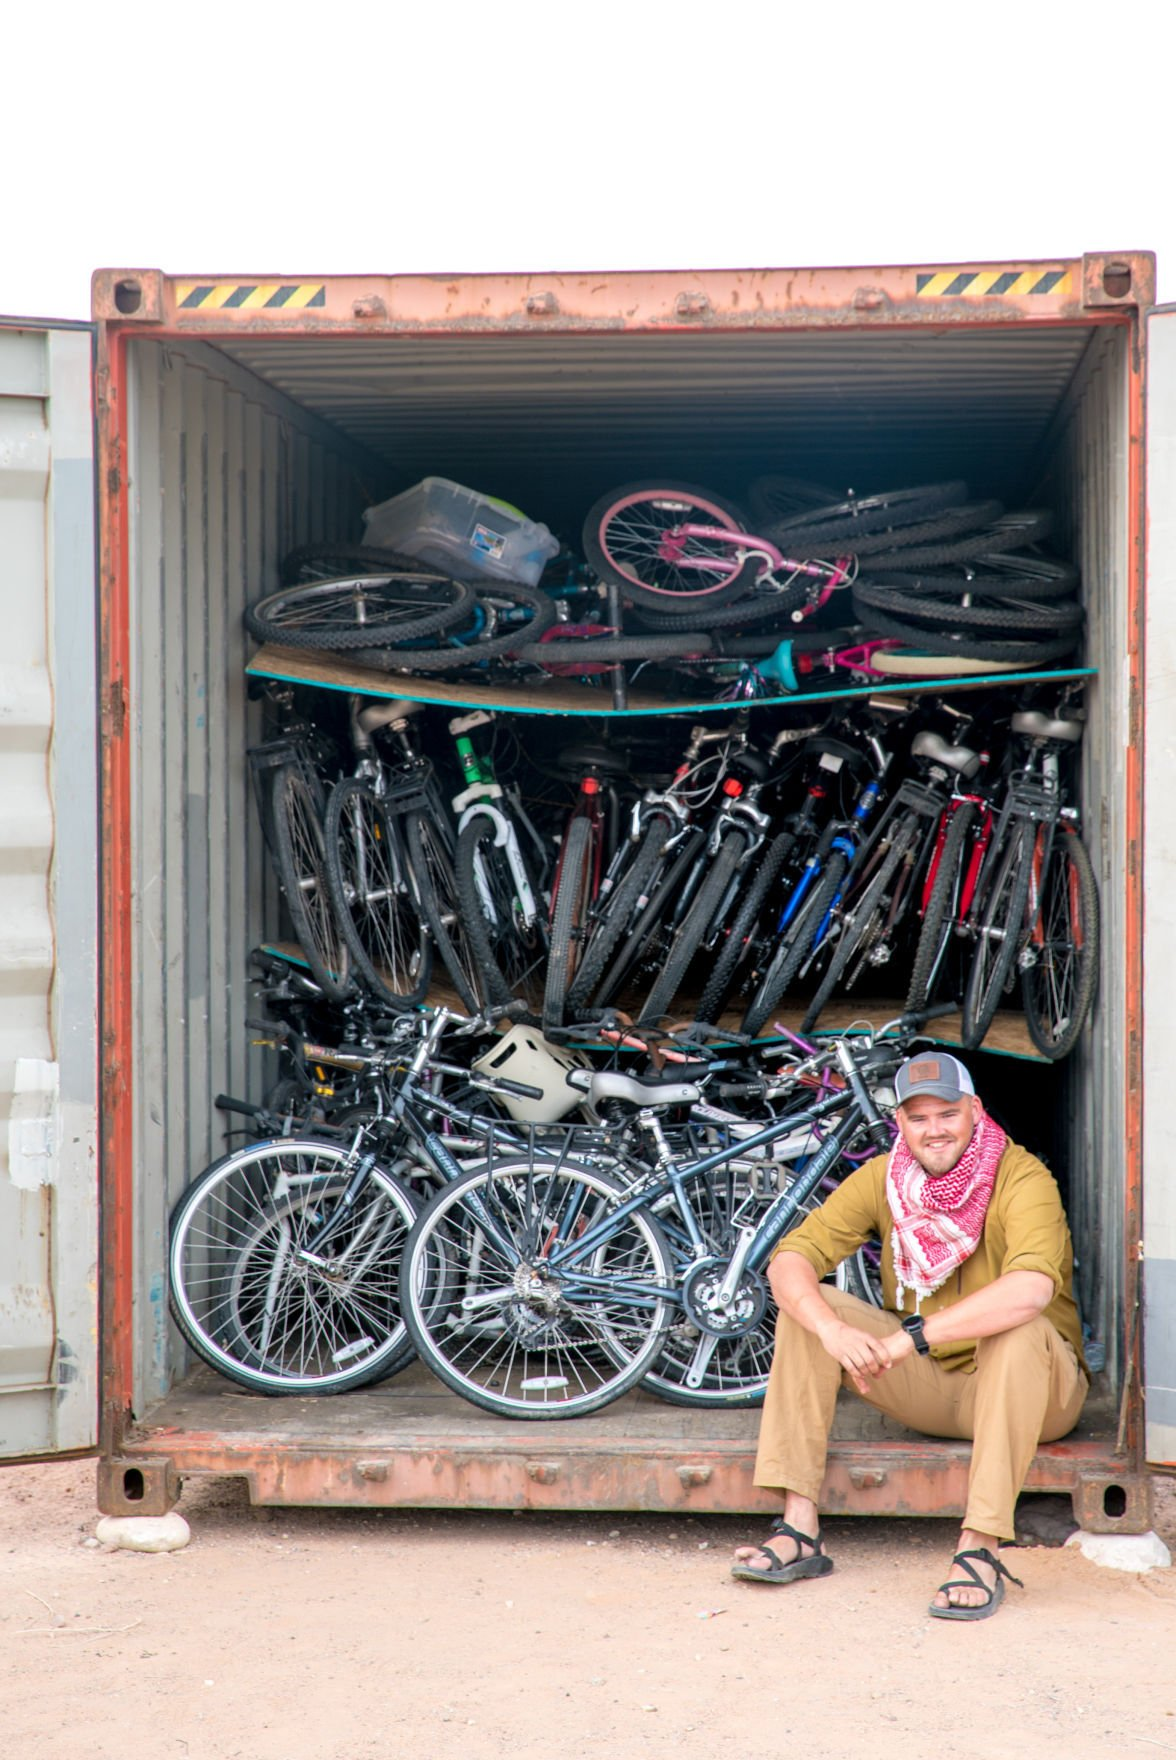 Bikes in Jordan